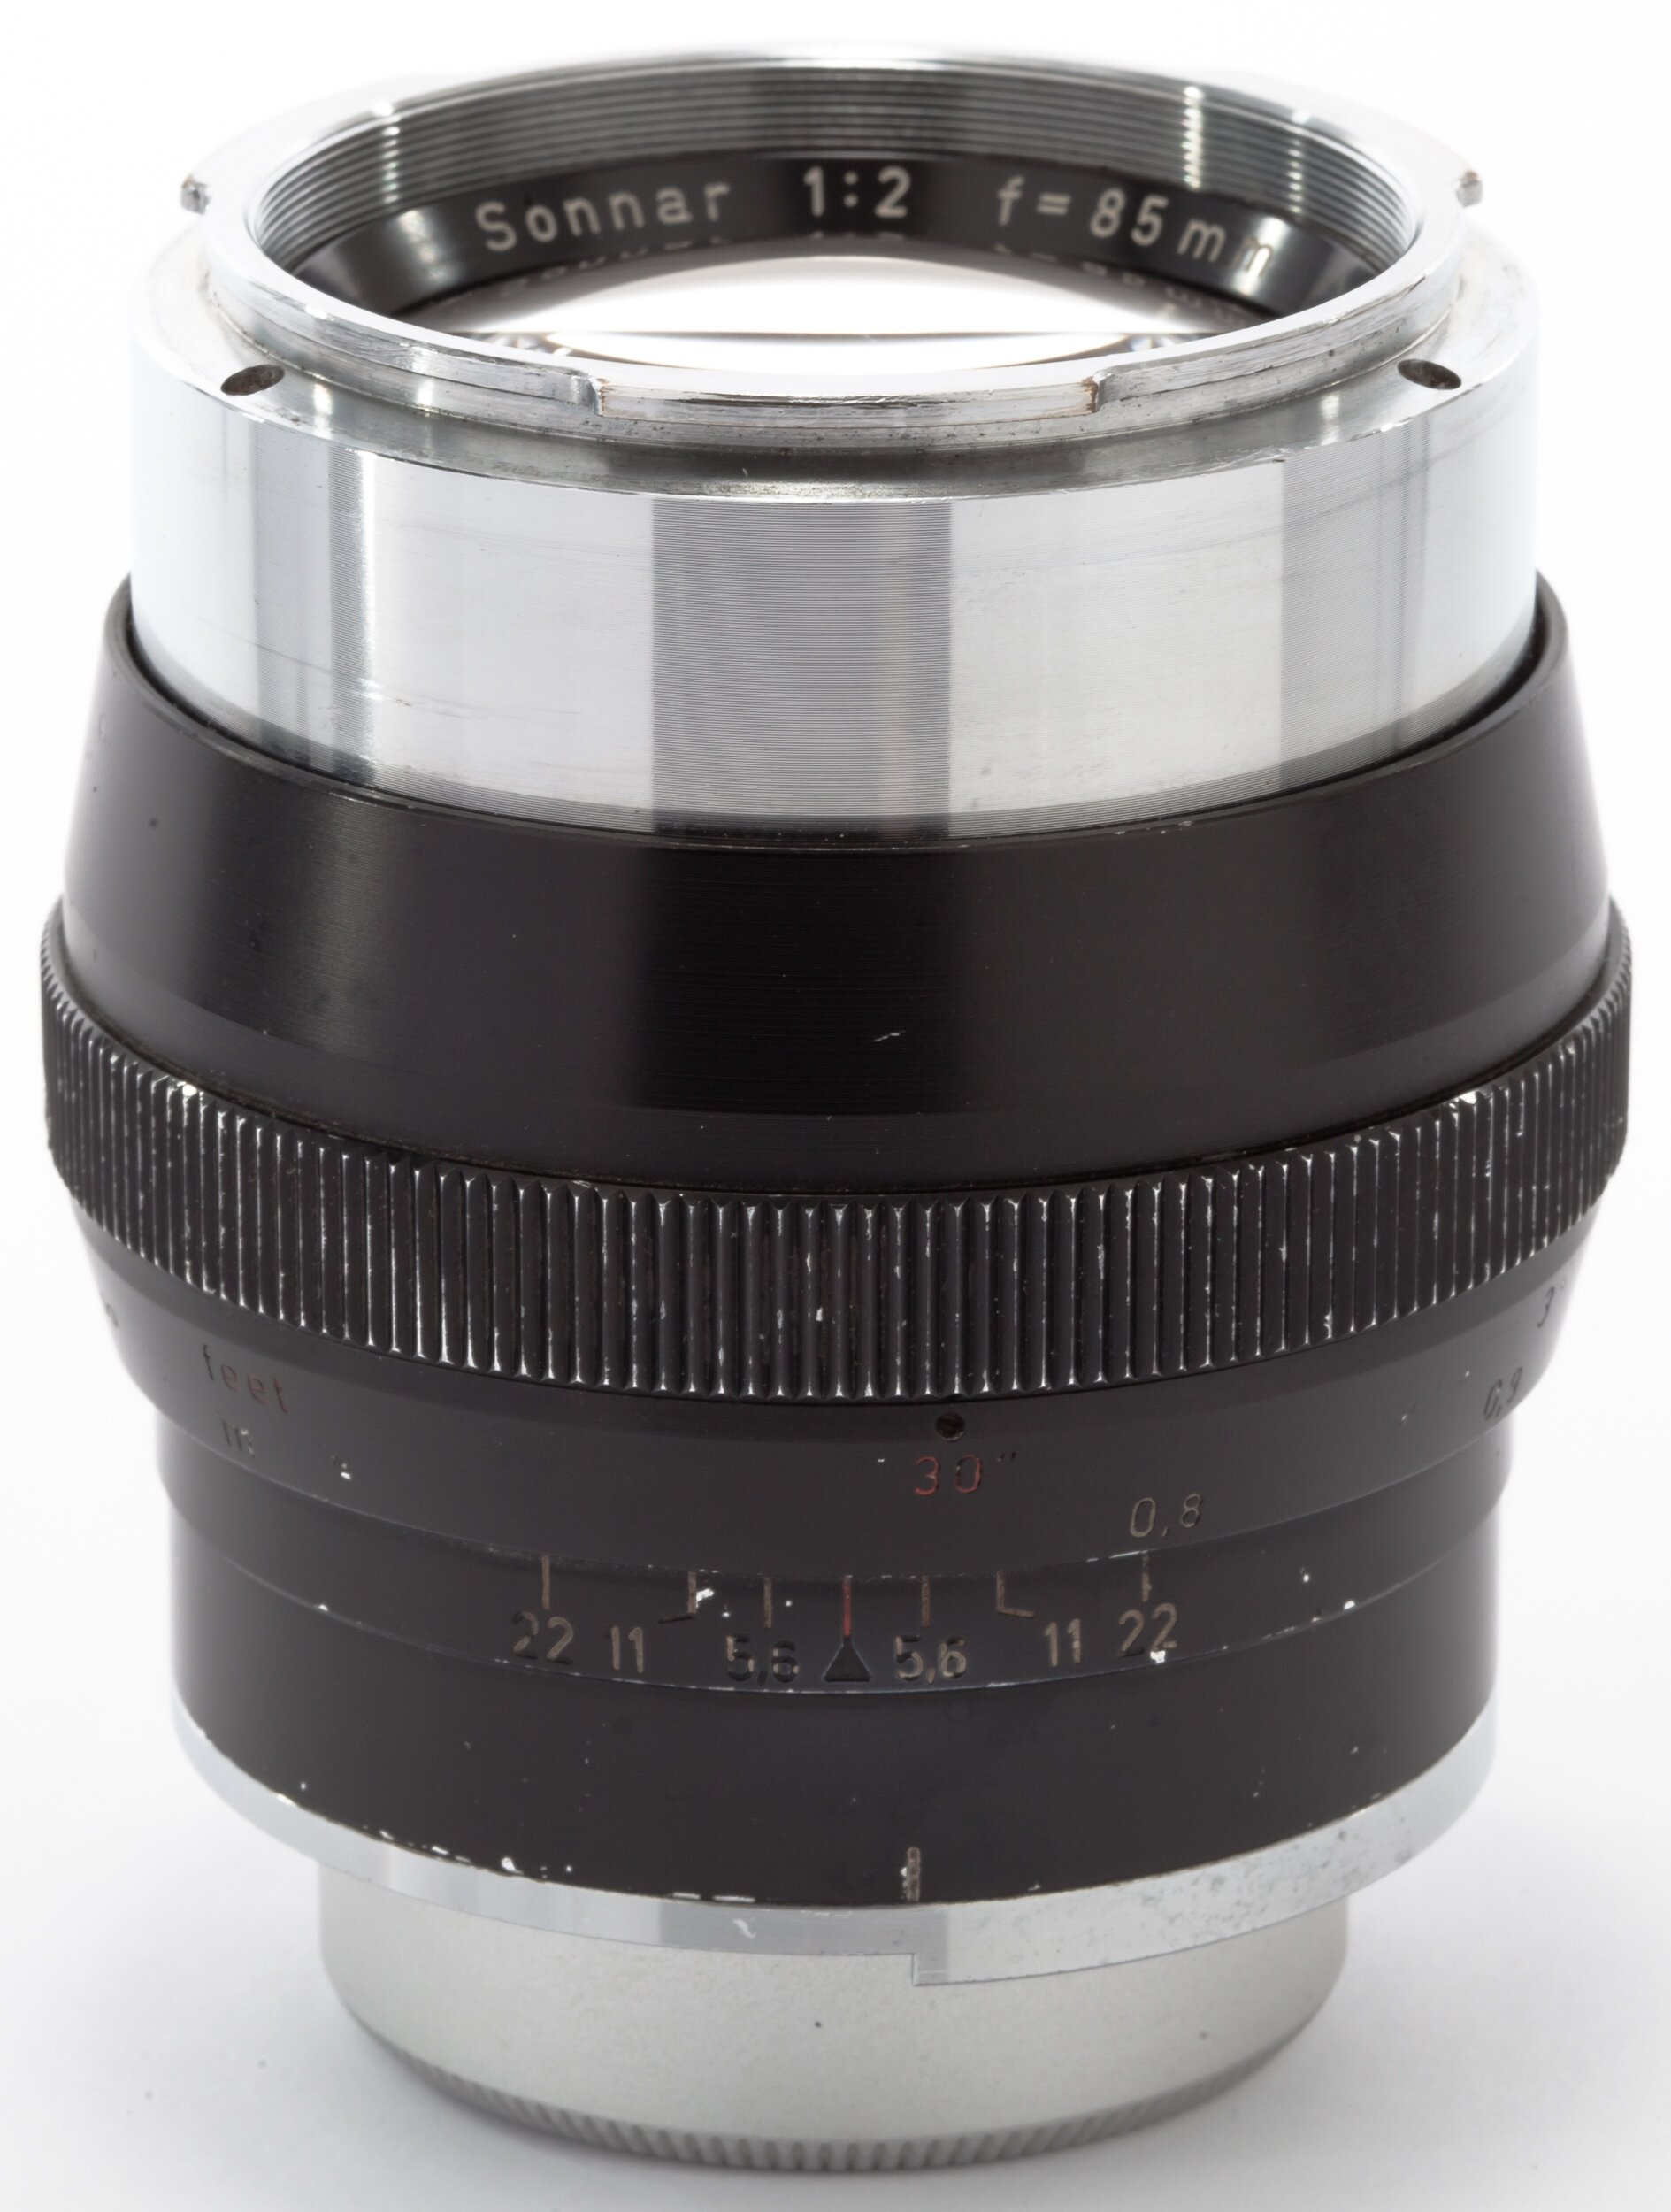 Carl Zeiss f. Contarex 85mm 2 Sonnar schwarz